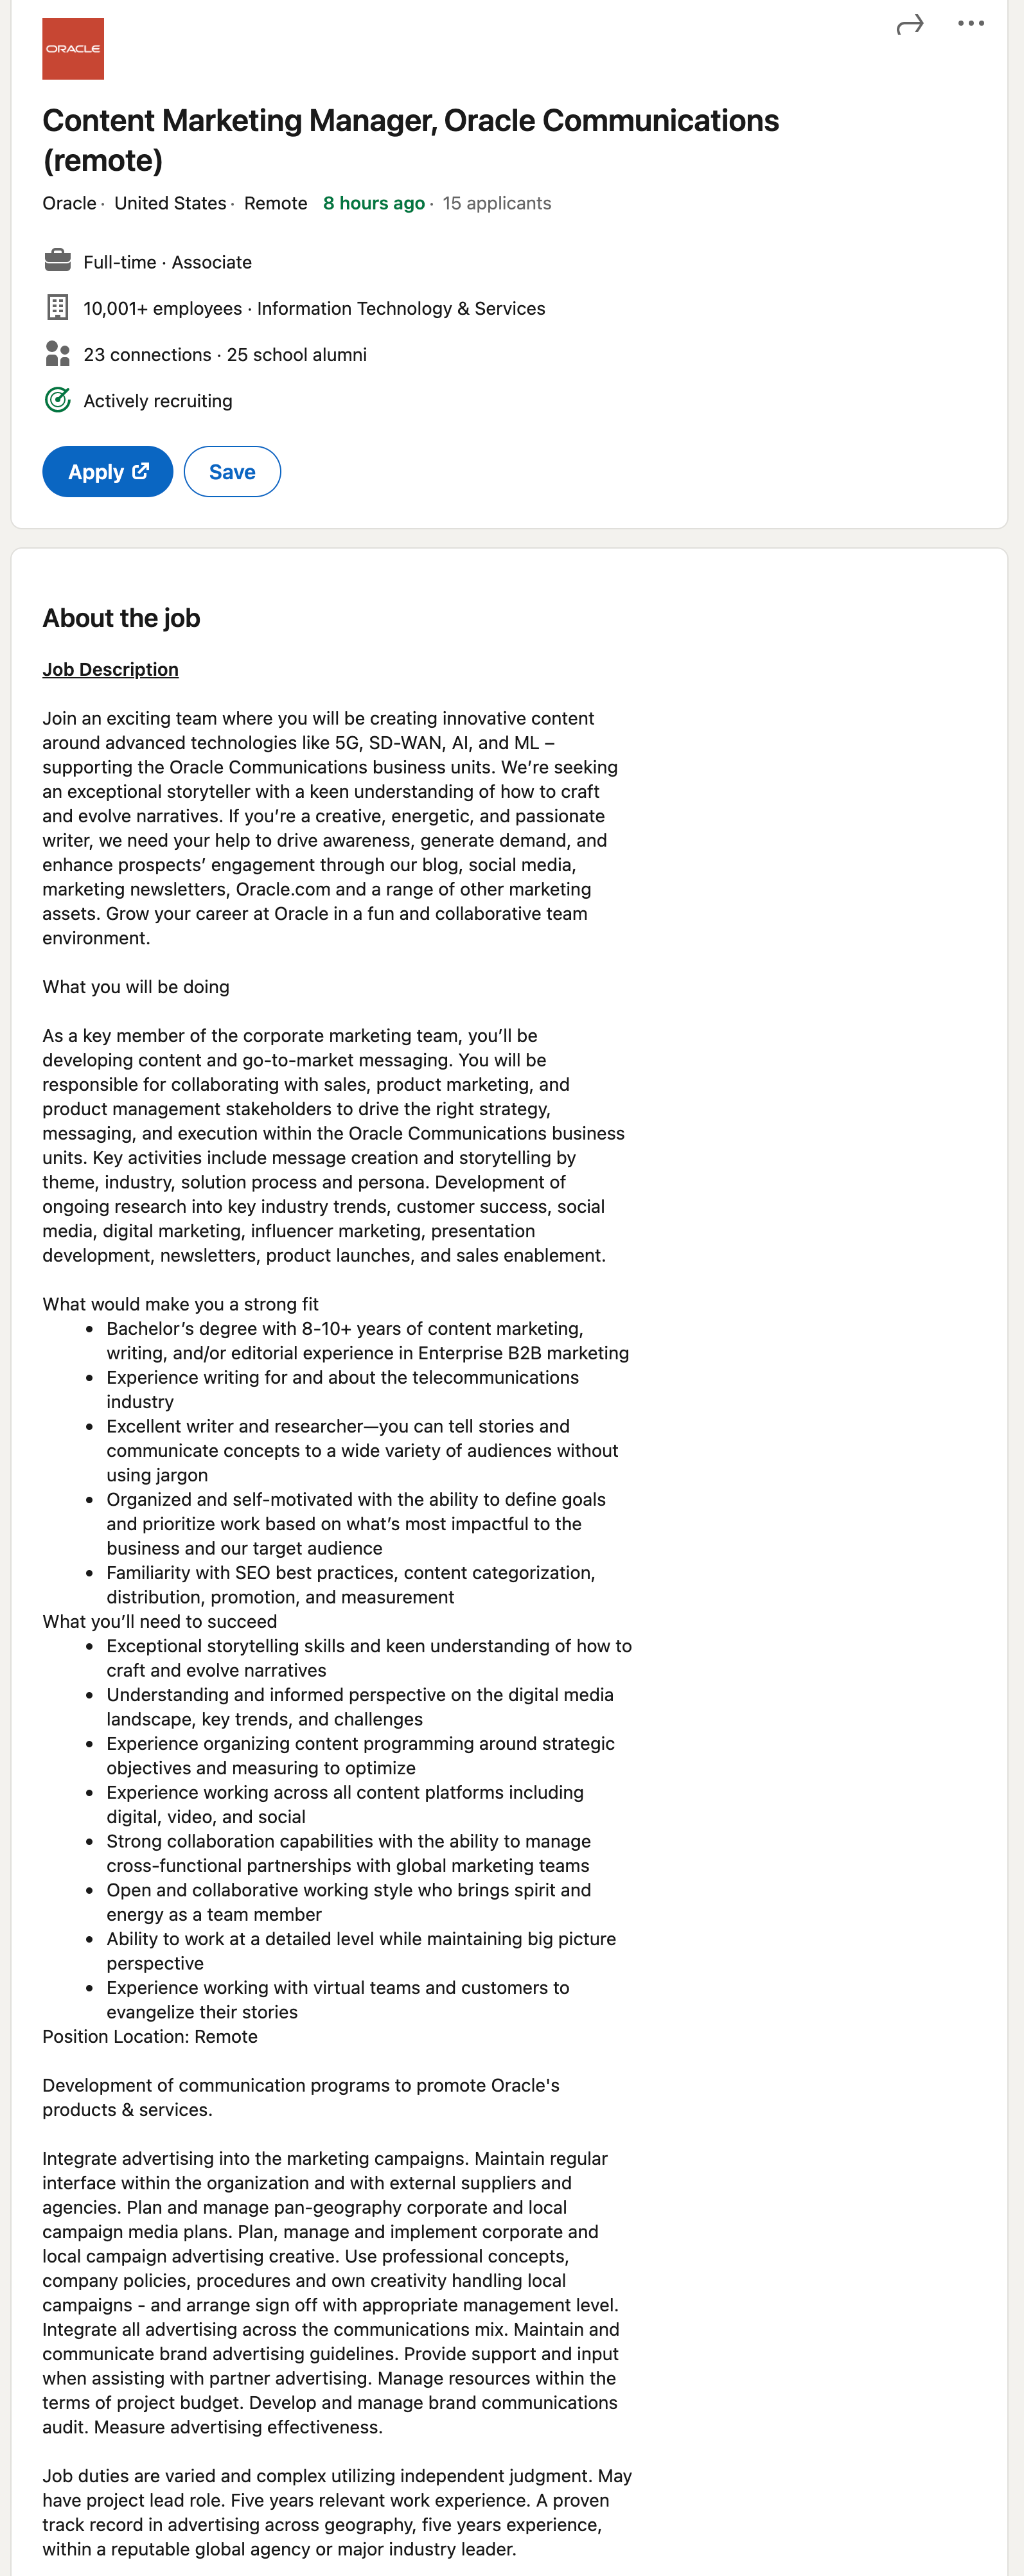 content marketing manager job description